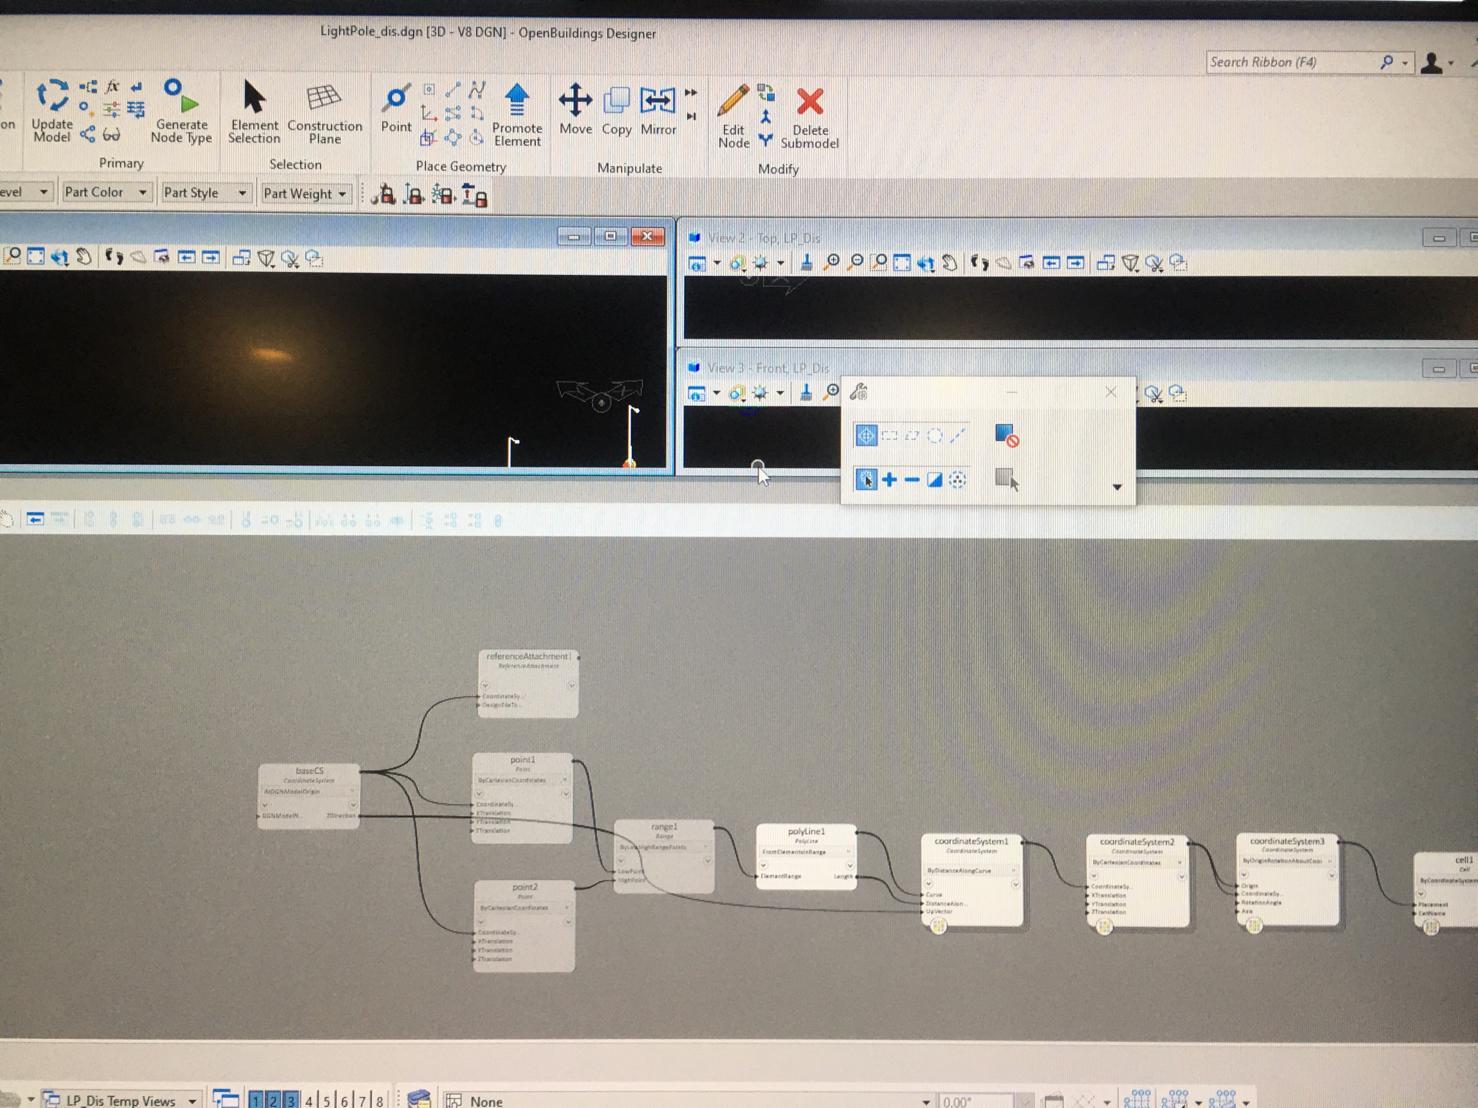 Generative design and nodes visualisation